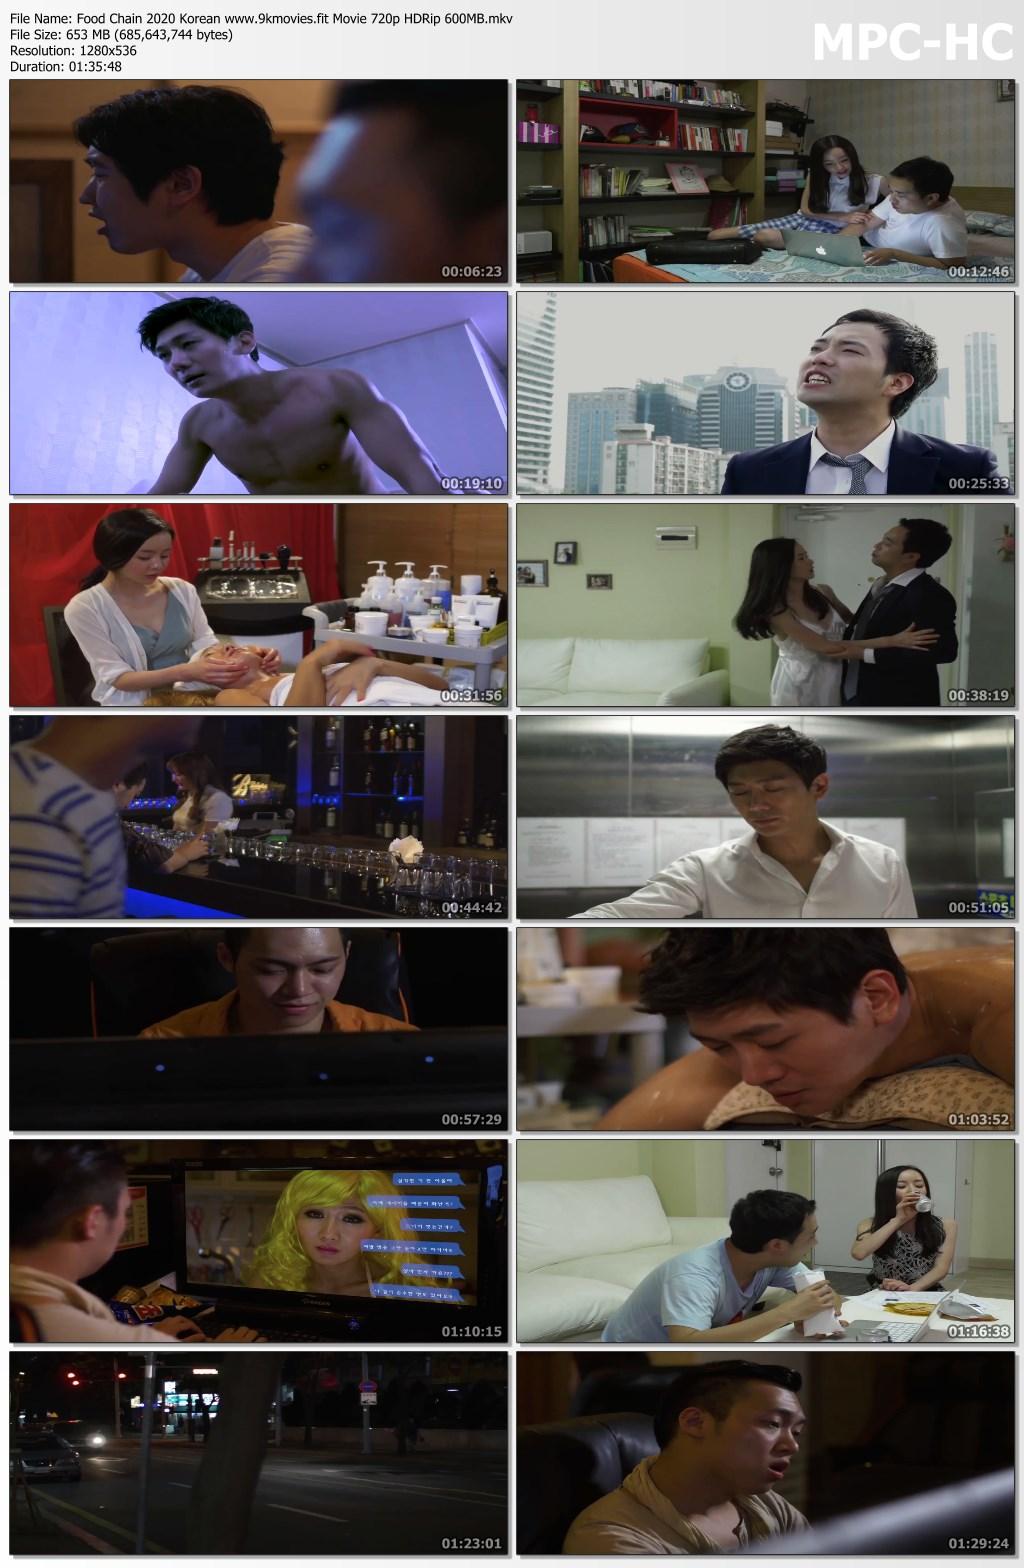 Food Chain 2020 Korean www.9kmovies.fit Movie 720p HDRip 600MB.mkv thumbs